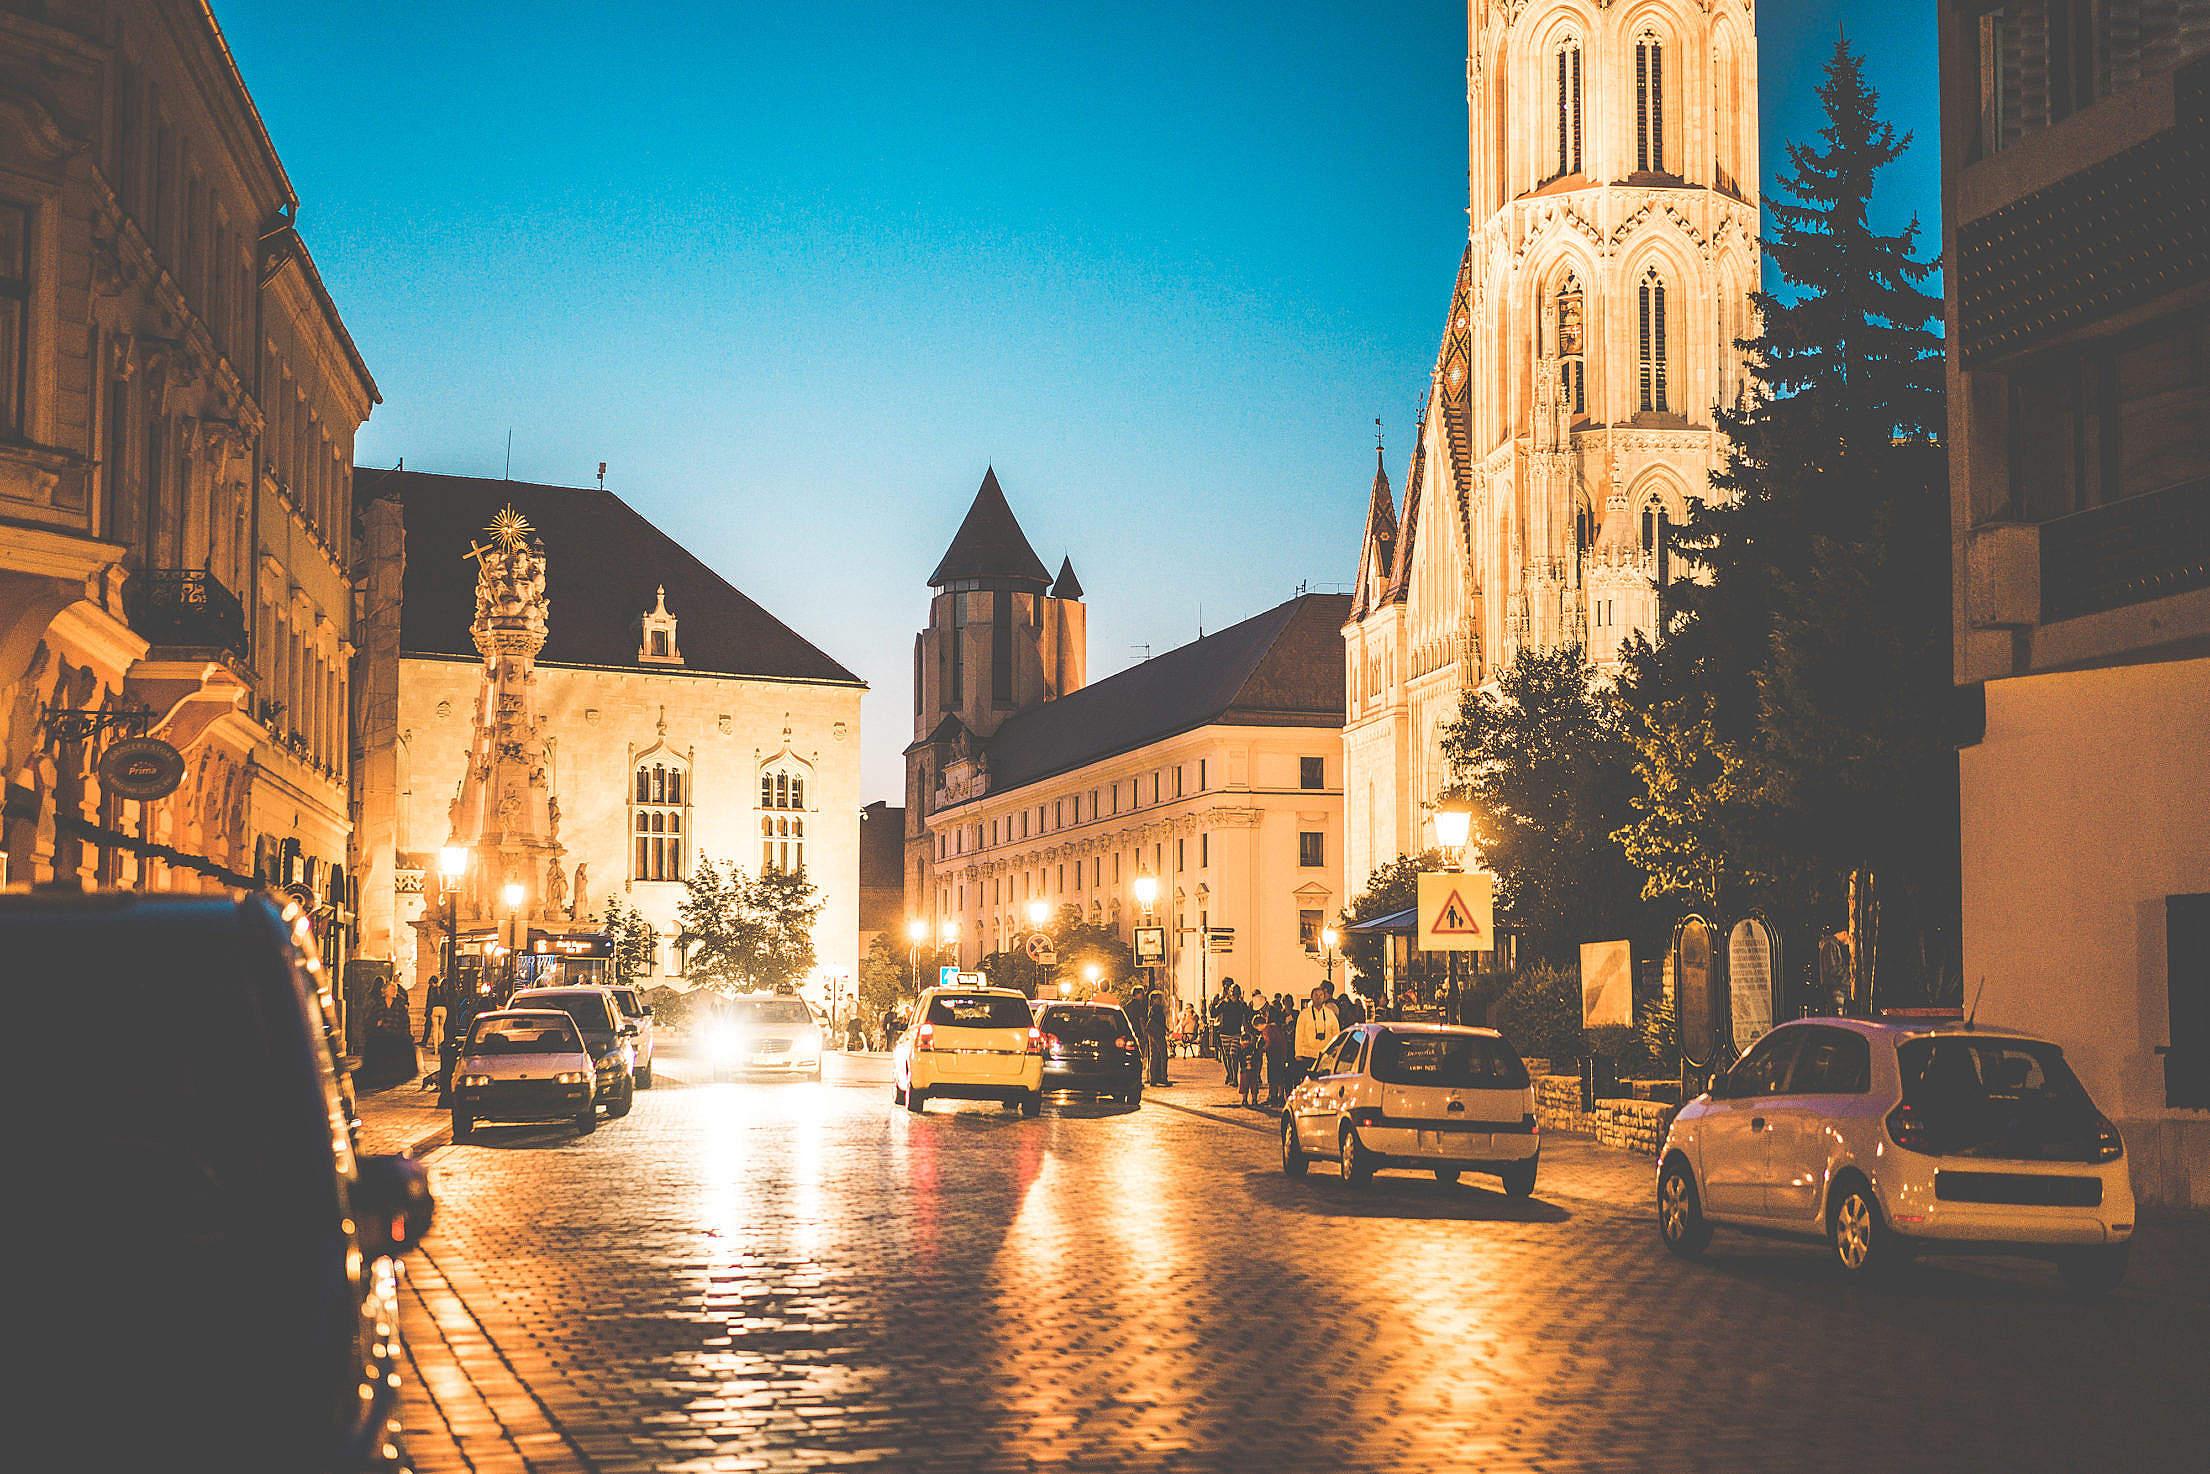 Rush Streets of Budapest, Hungary at Night Free Stock Photo